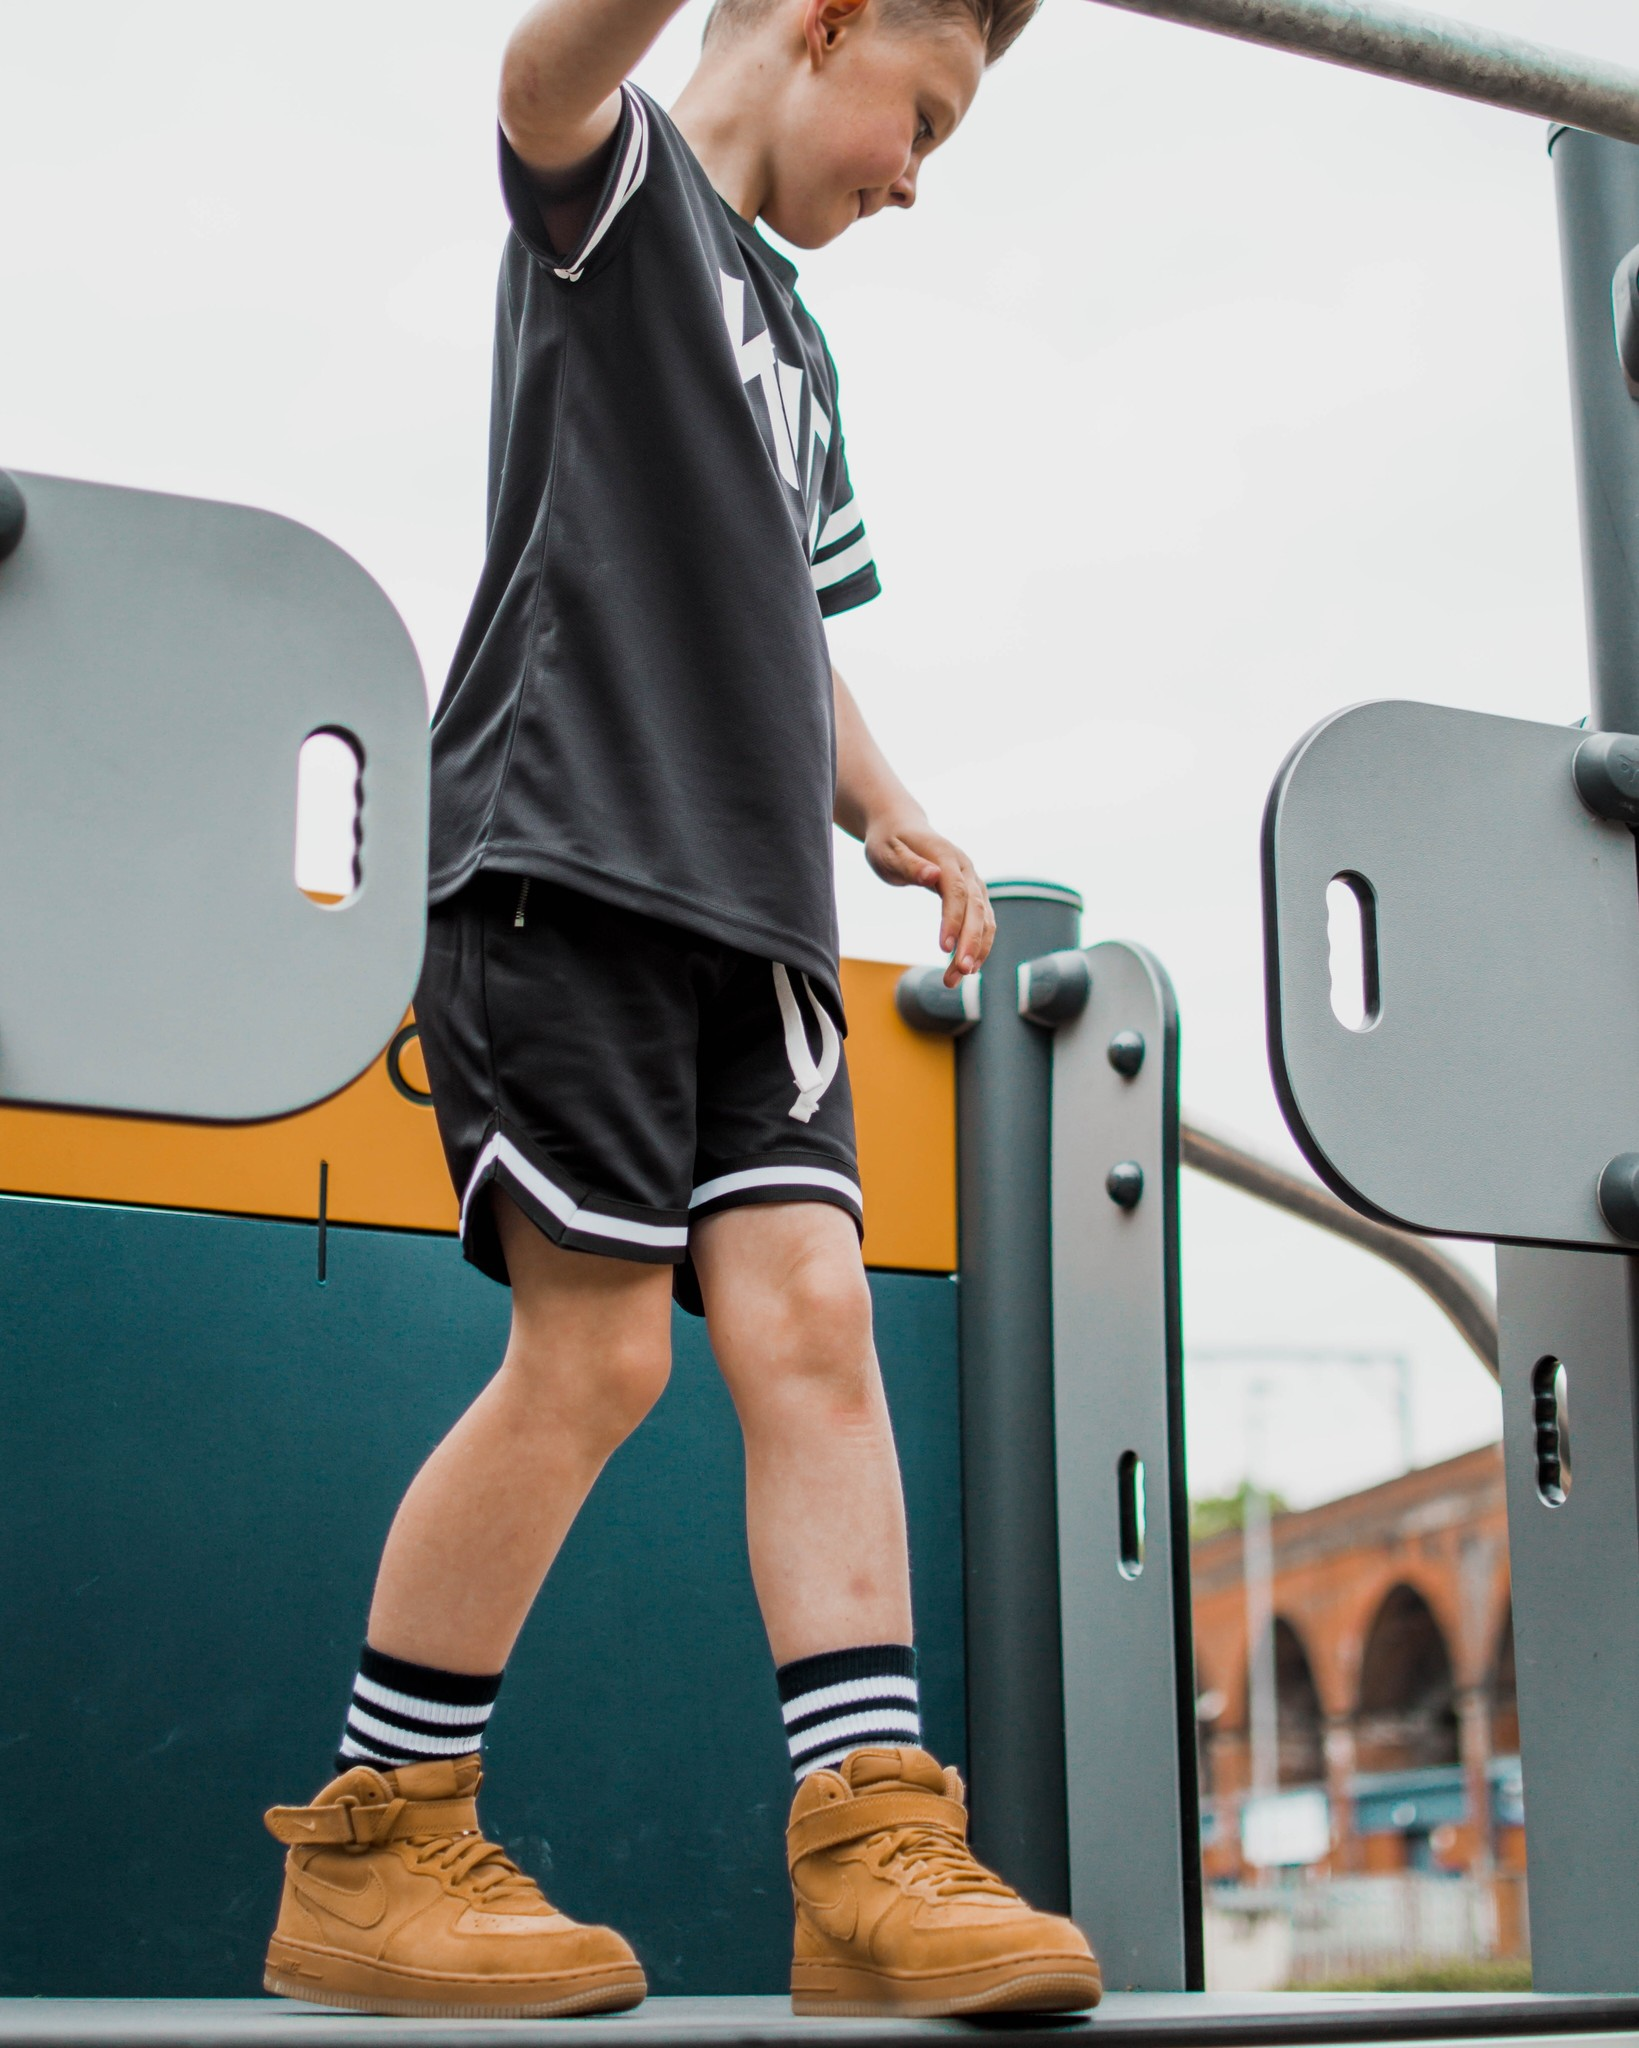 Beaubella Kids ZWARTE BASEBALL SHORTS | ZWART COMFORTABELE KORTE BROEK | BEAUBELLAKIDS